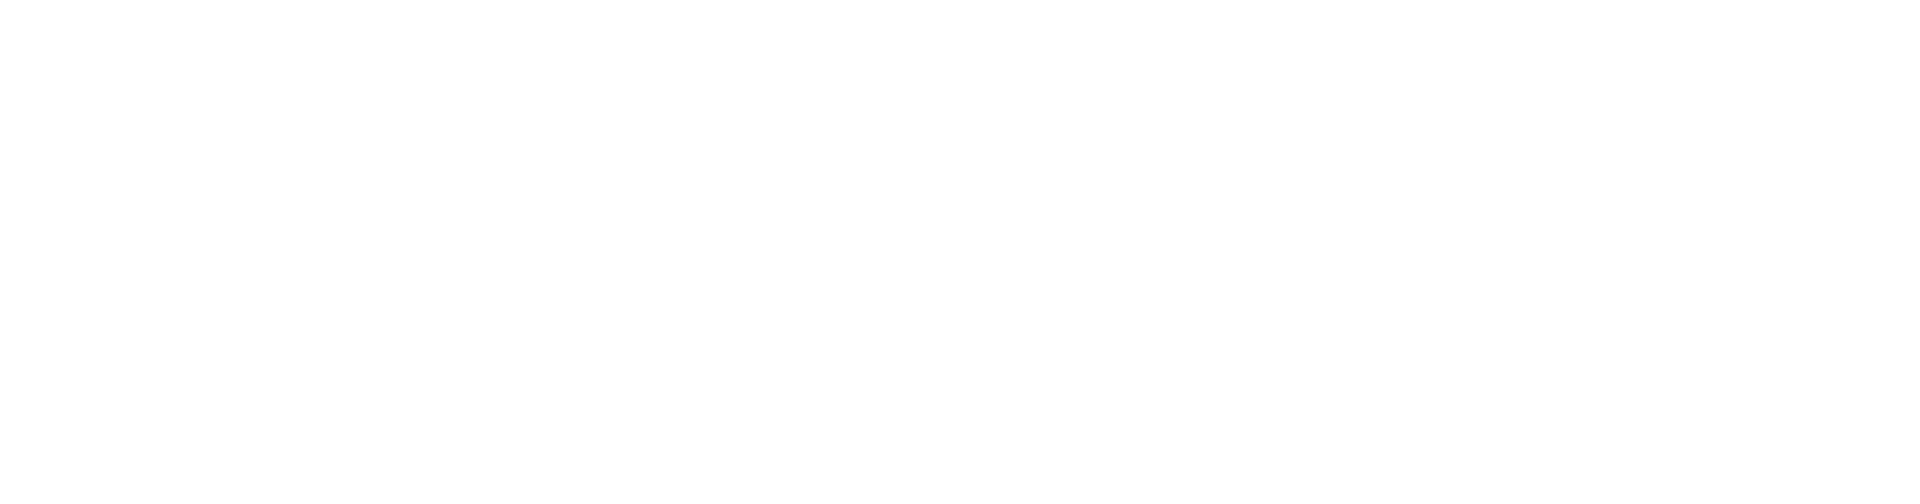 logo_digital_white_access-1